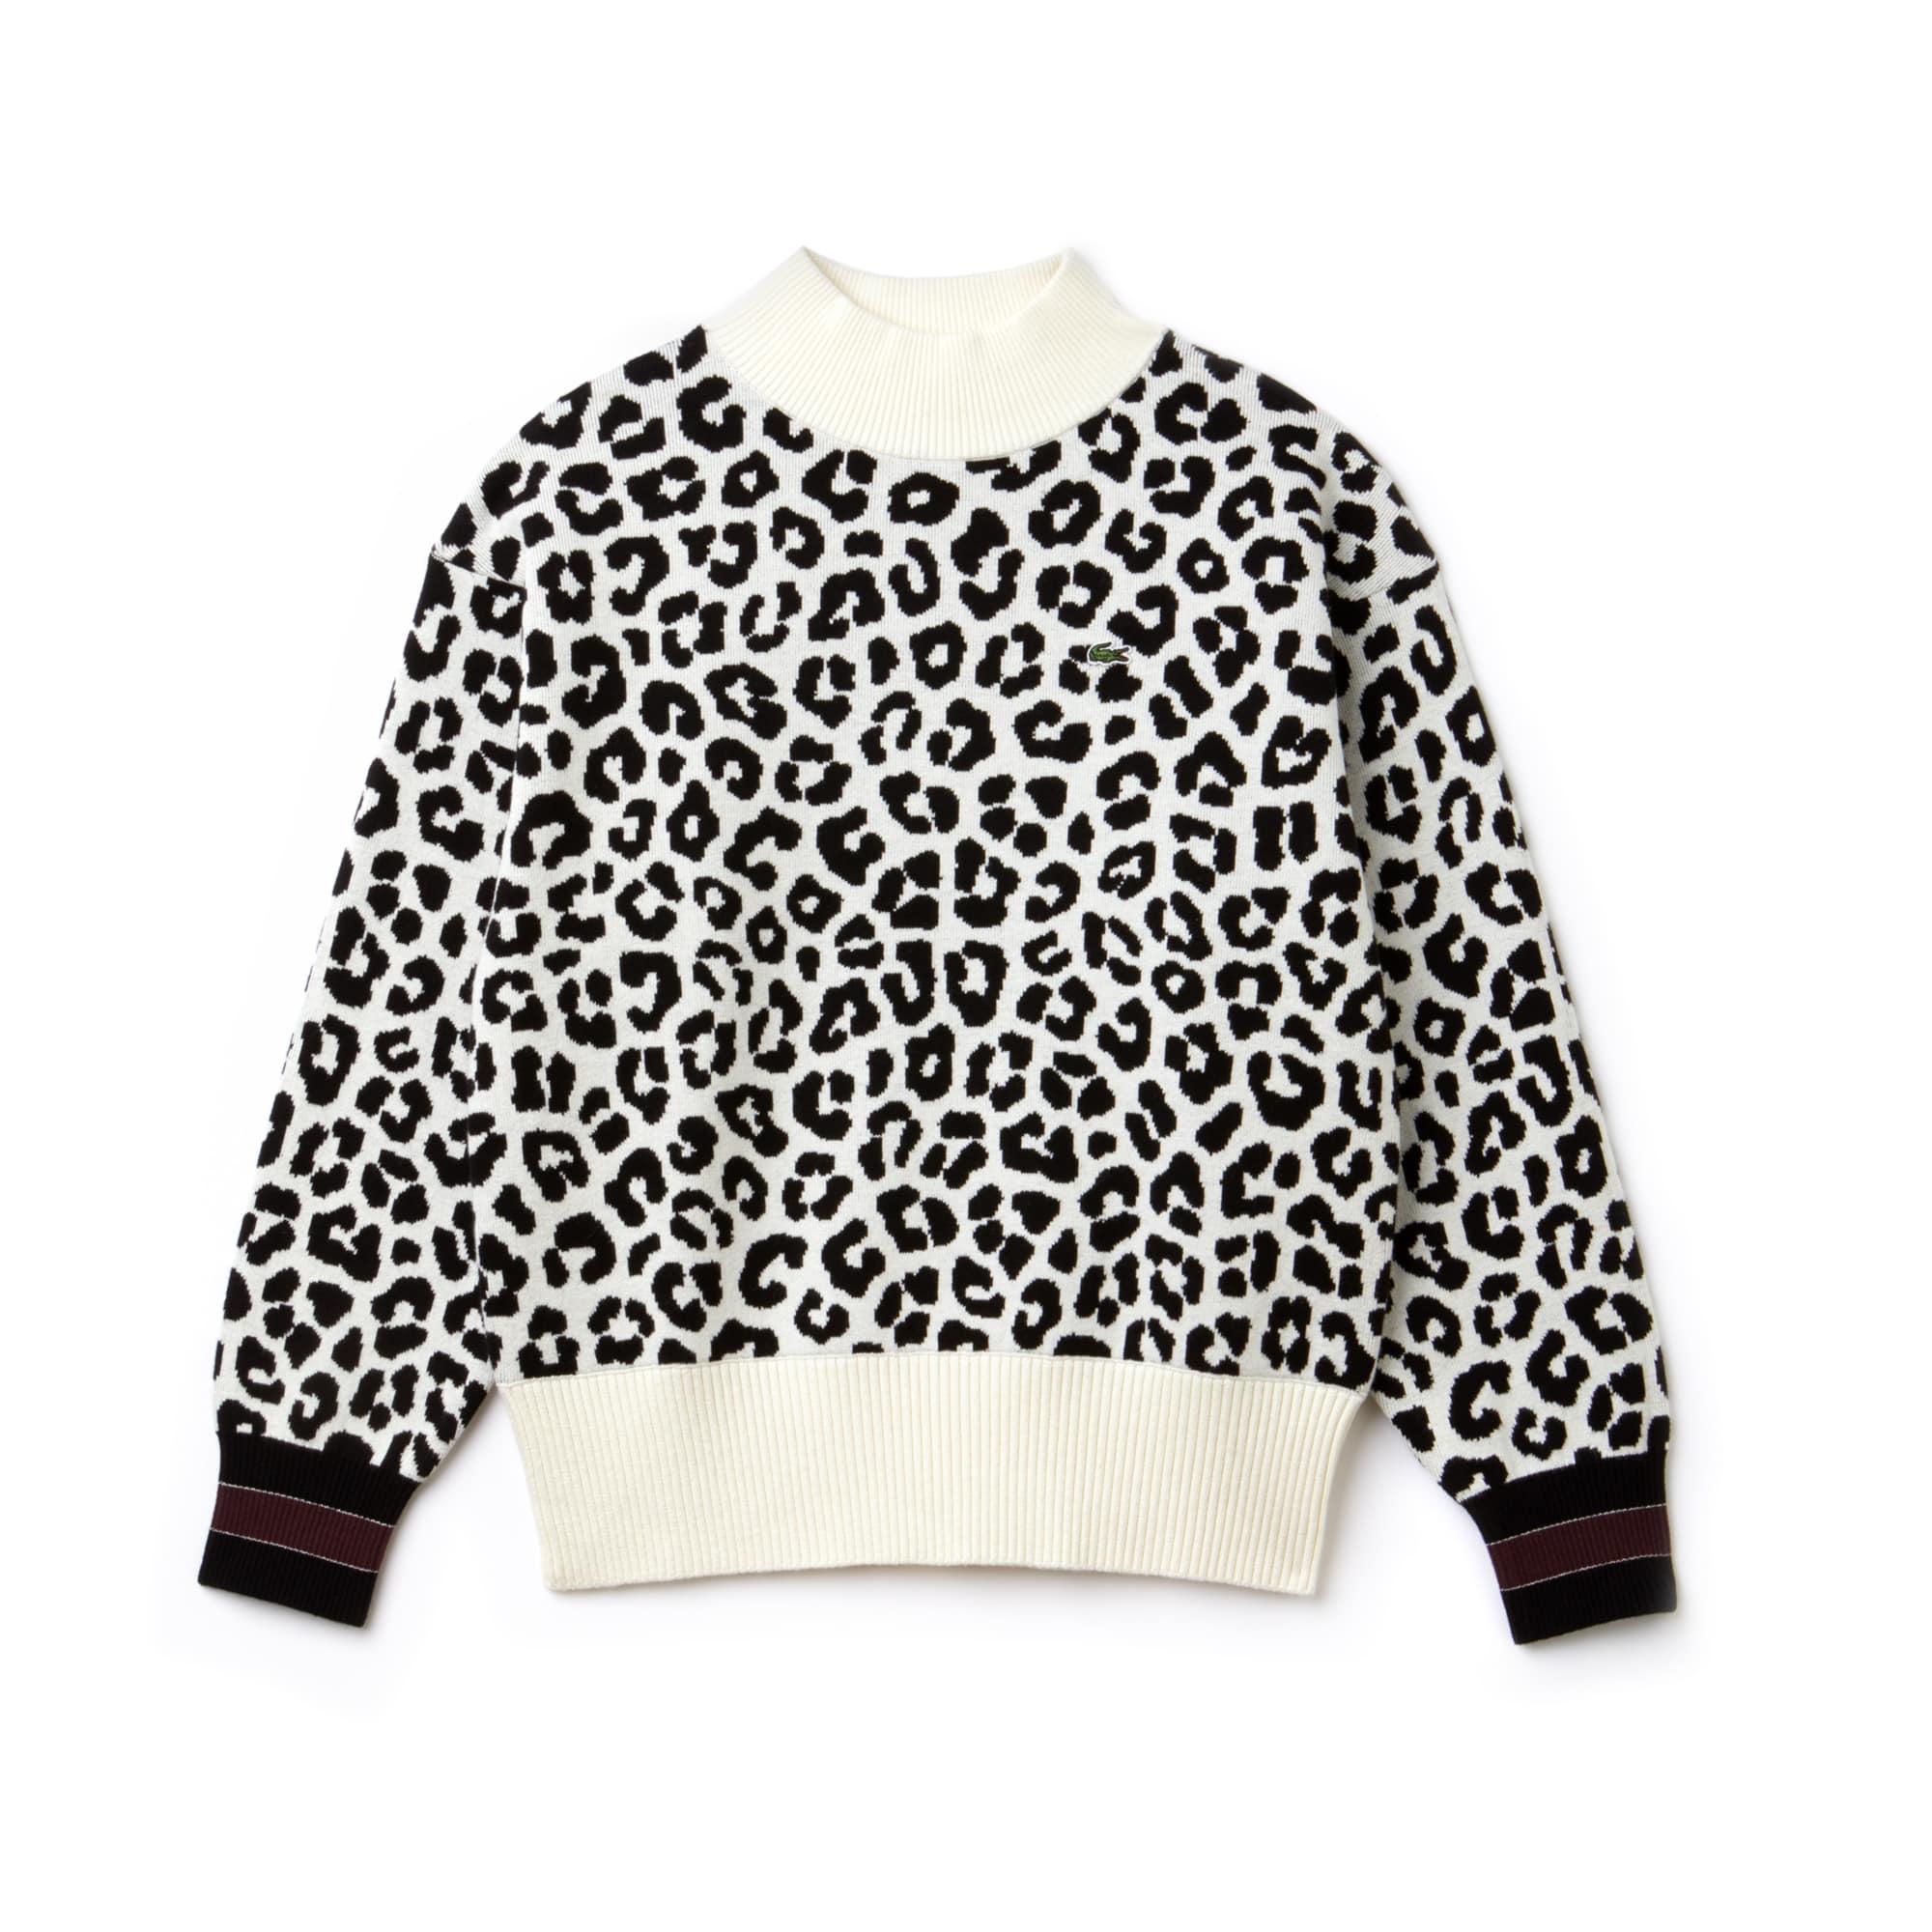 Women's Lacoste LIVE Leopard Print Jacquard Sweater